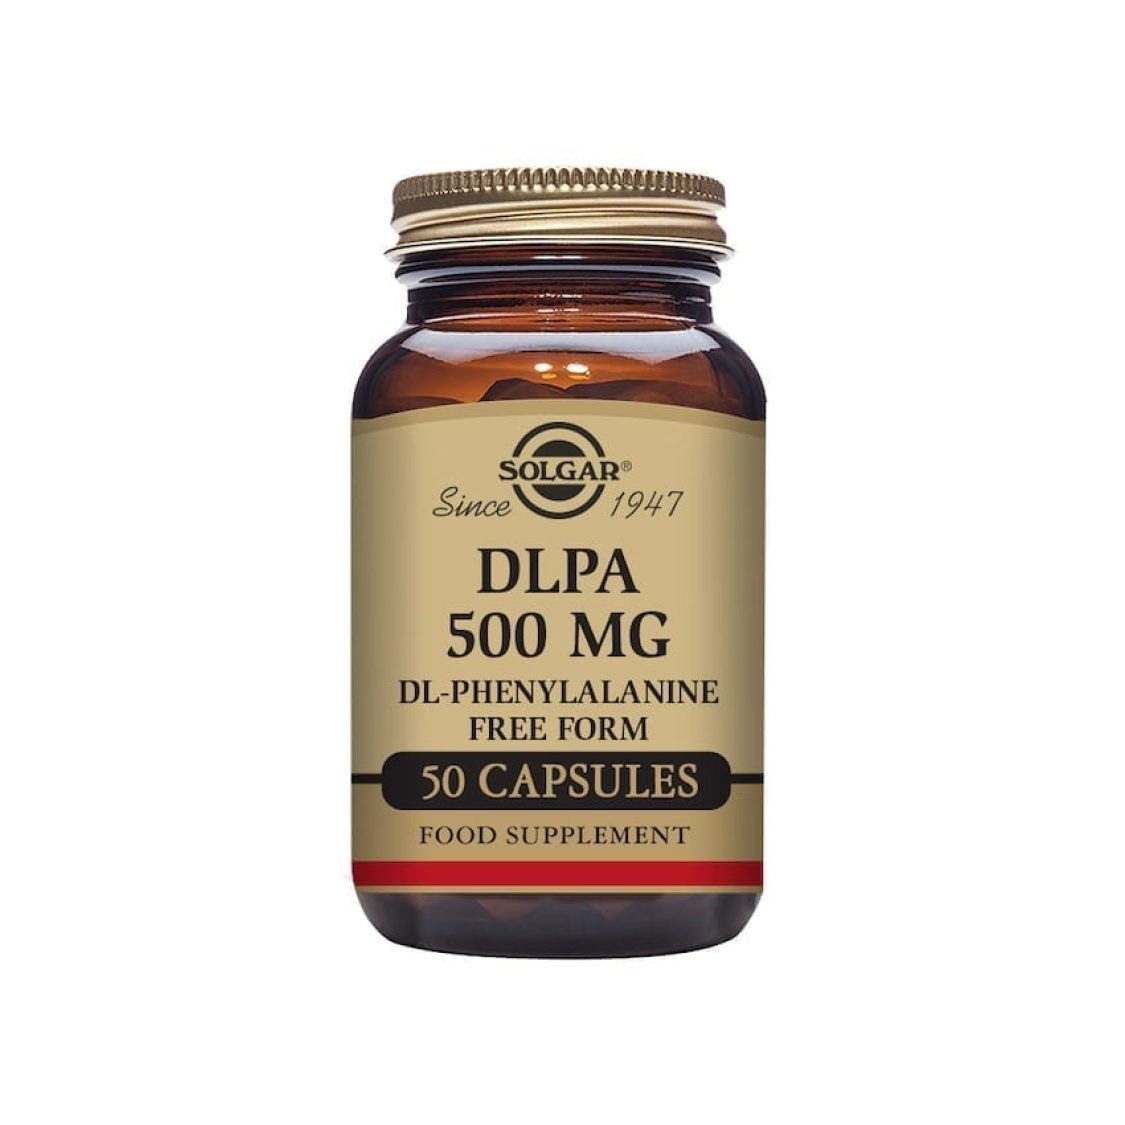 Solgar - Free Form Amino Acids - DLPA 500mg Vegicaps - Size: 50